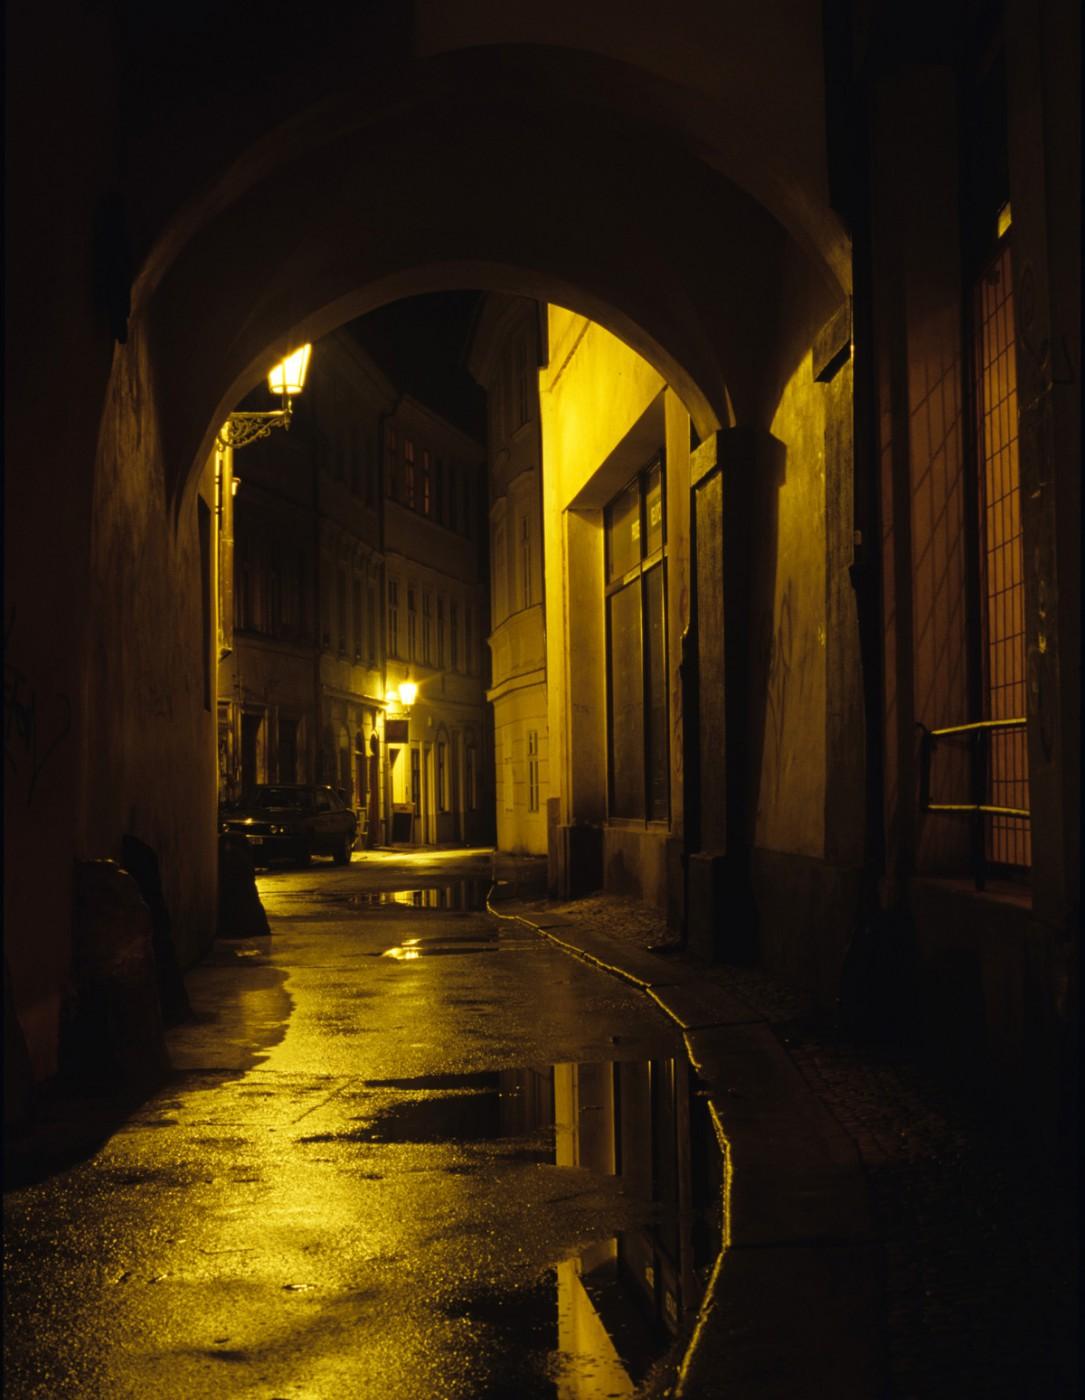 Dan Falk, </span><span><em>Prague After Dark: The Alley</em>, </span><span>C-Print from slide film, 18 x 12